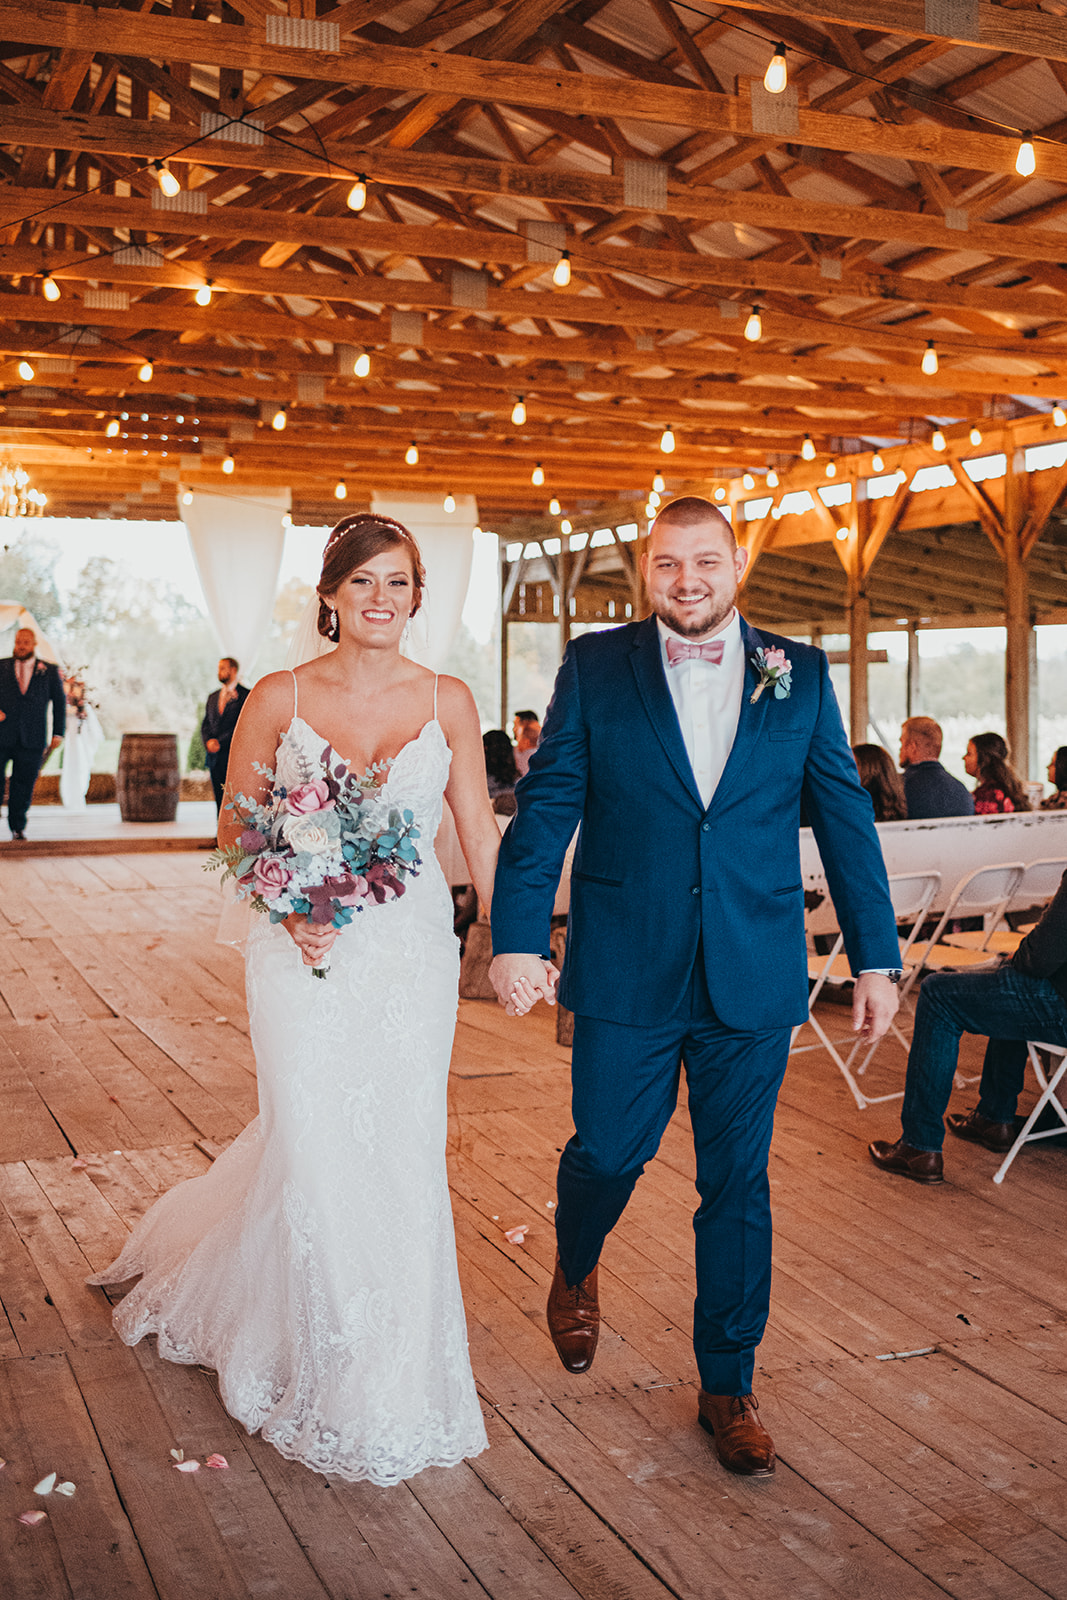 Burdoc Farms wedding ceremony